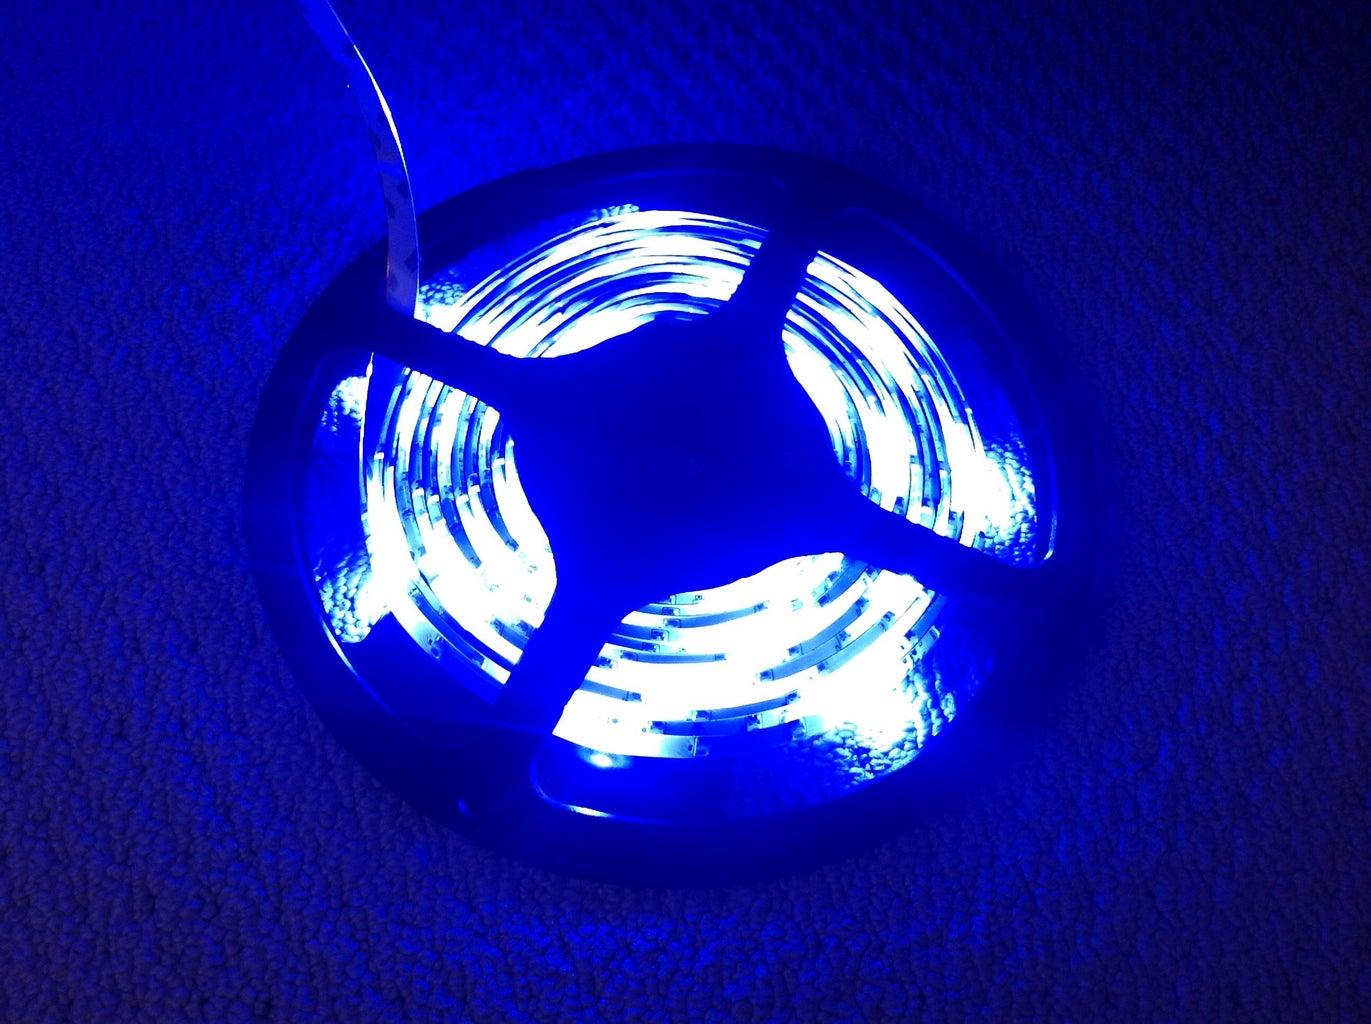 Purchase an LED Strip